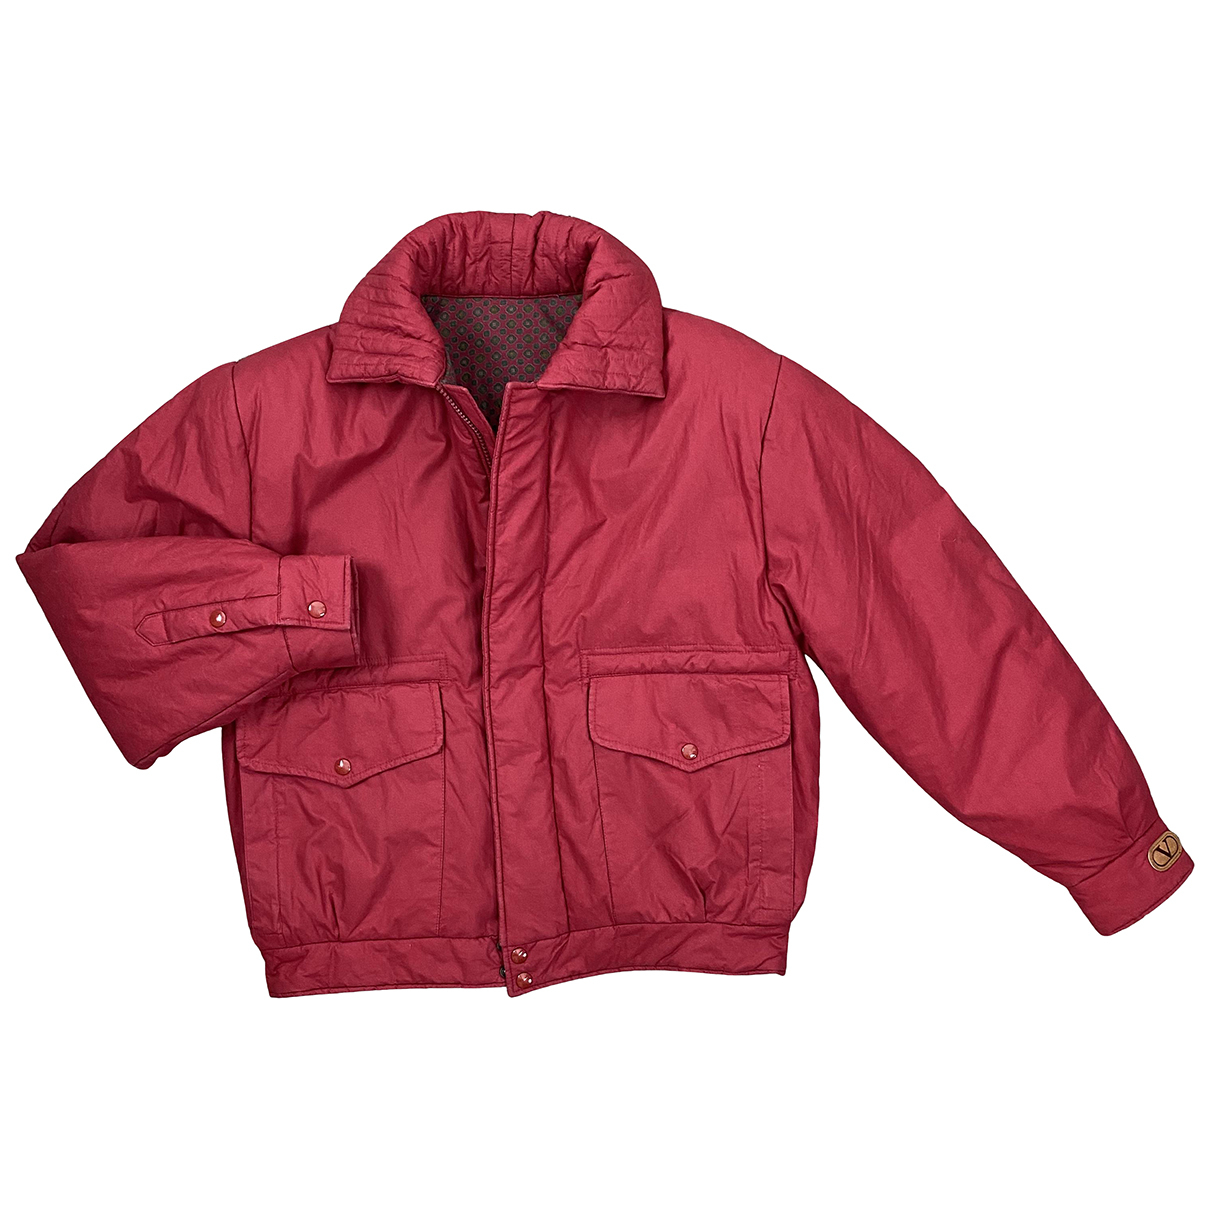 Valentino Garavani N Red coat for Women S International